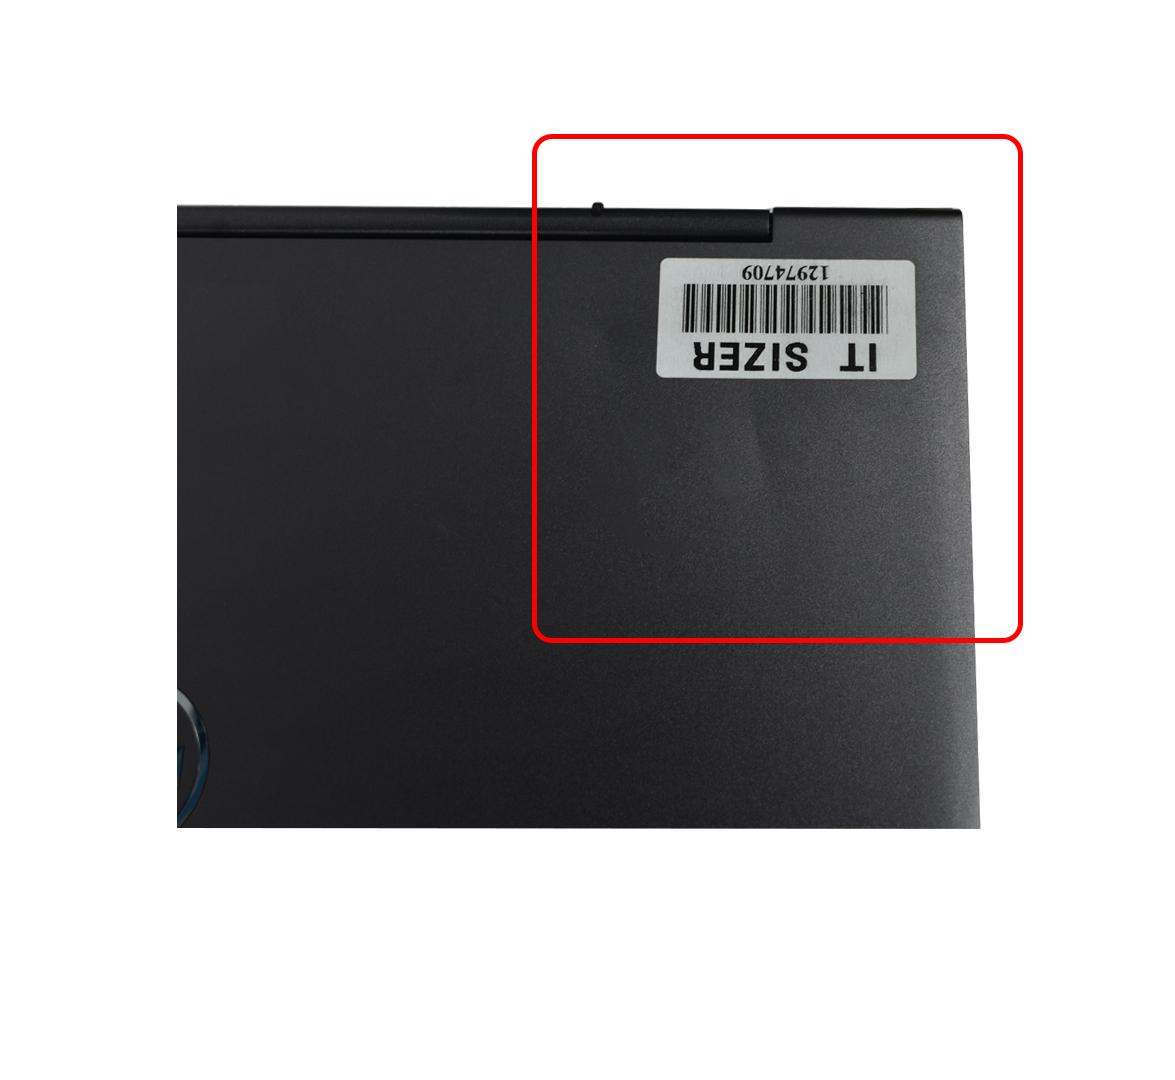 Dell Latitude 7390 (2-in-1) Business Laptop, Intel Core i7 -8650U CPU, 16GB DDR3L SODIMM RAM, 128GB SSD M2, 13 inch 360 Display, Windows 10 Pro (Refurbished)